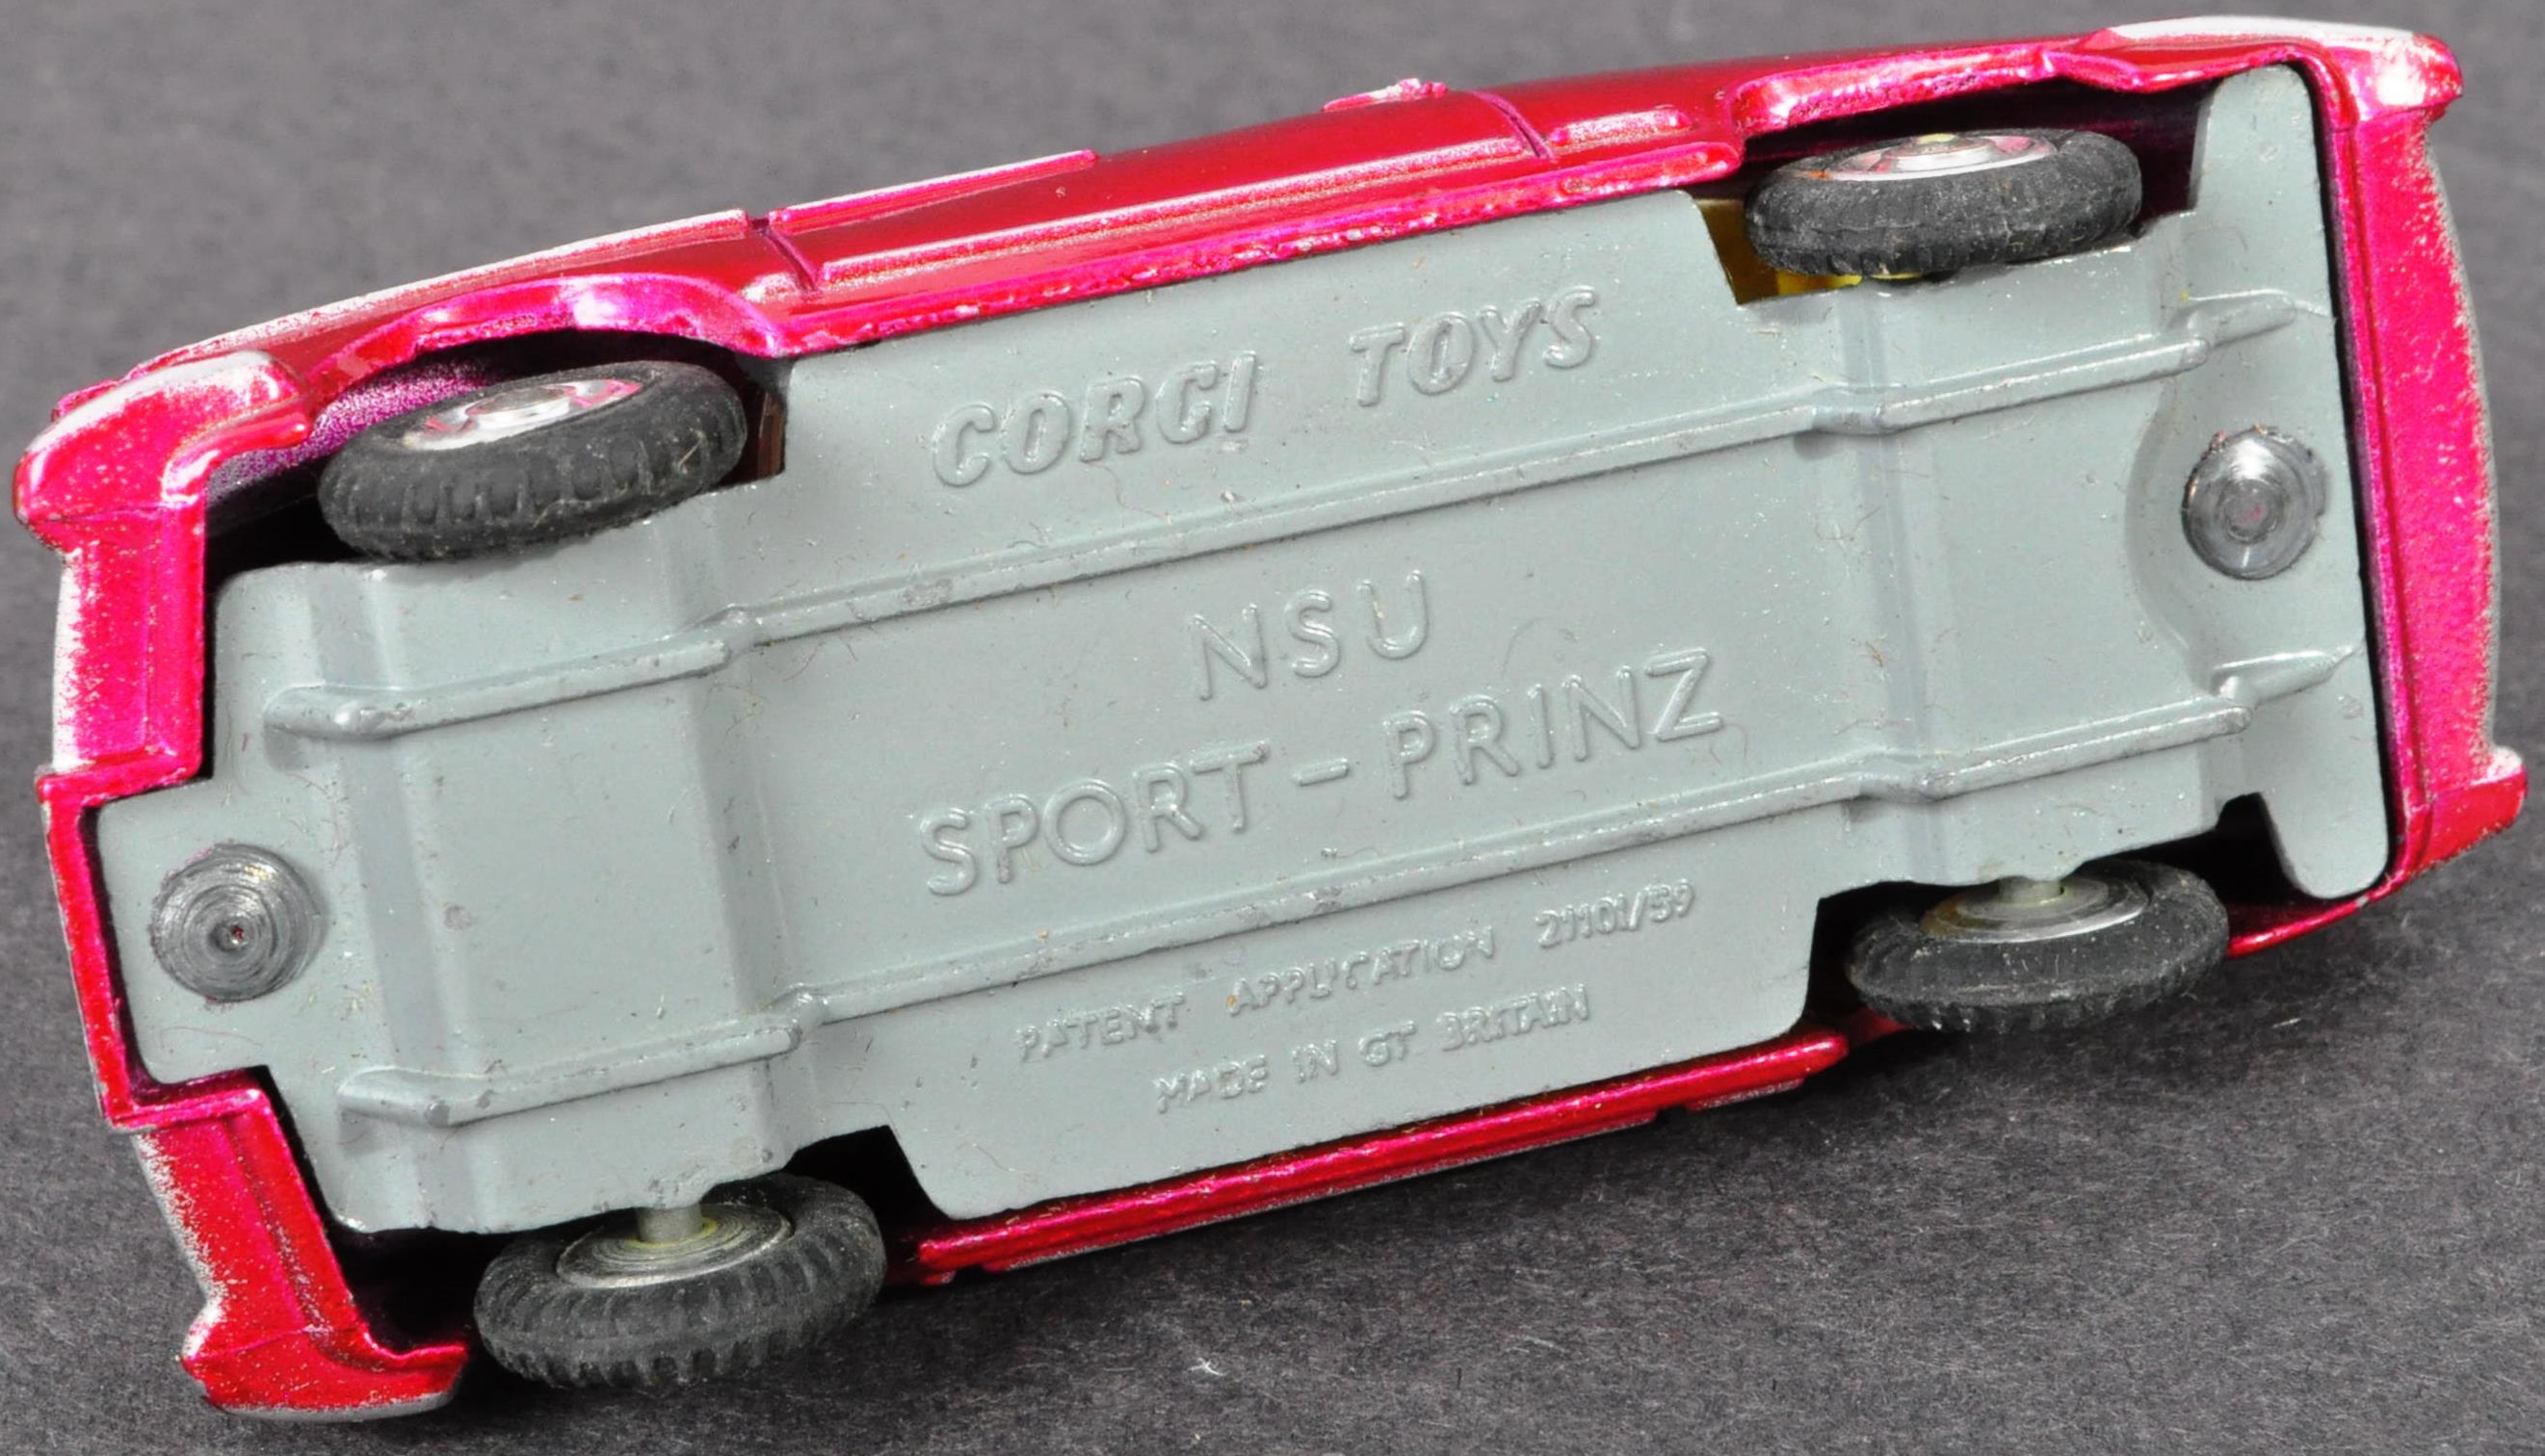 VINTAGE CORGI TOYS BOXED DIECAST MODEL 316 NSU PRINZ - Image 4 of 5